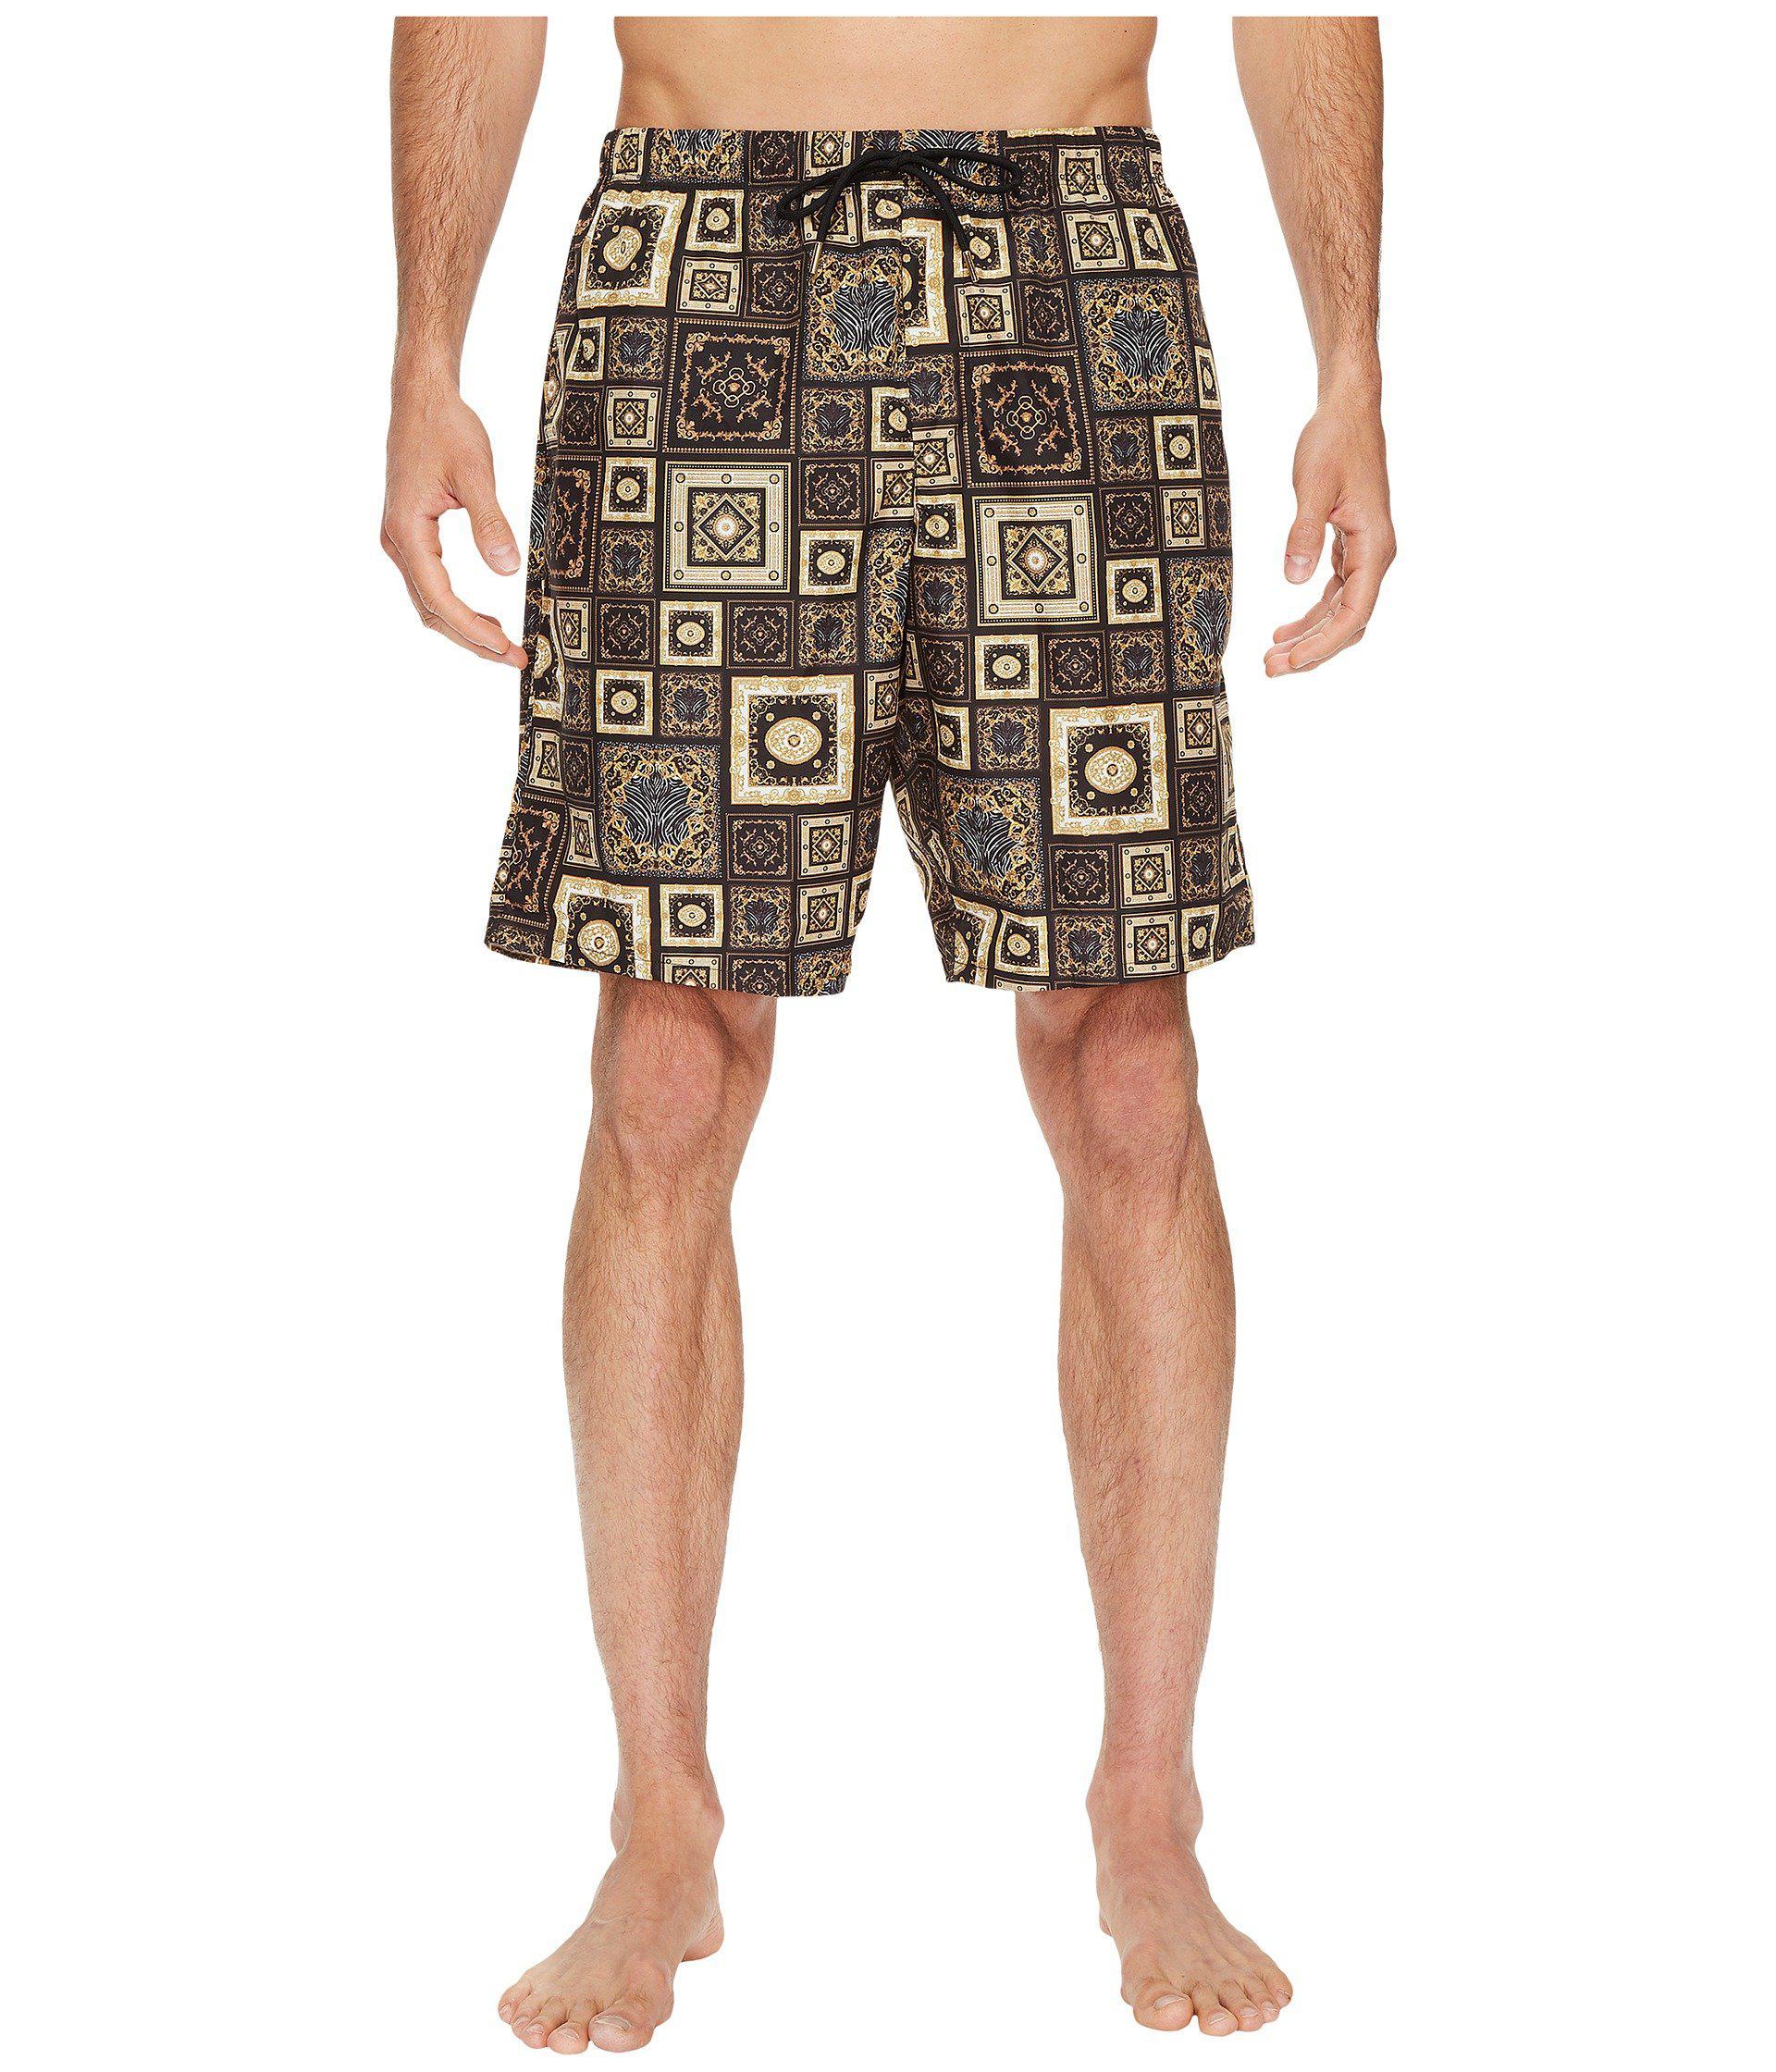 e6e41ca463 Lyst - Versace Printed Beach Long Shorts in Black for Men